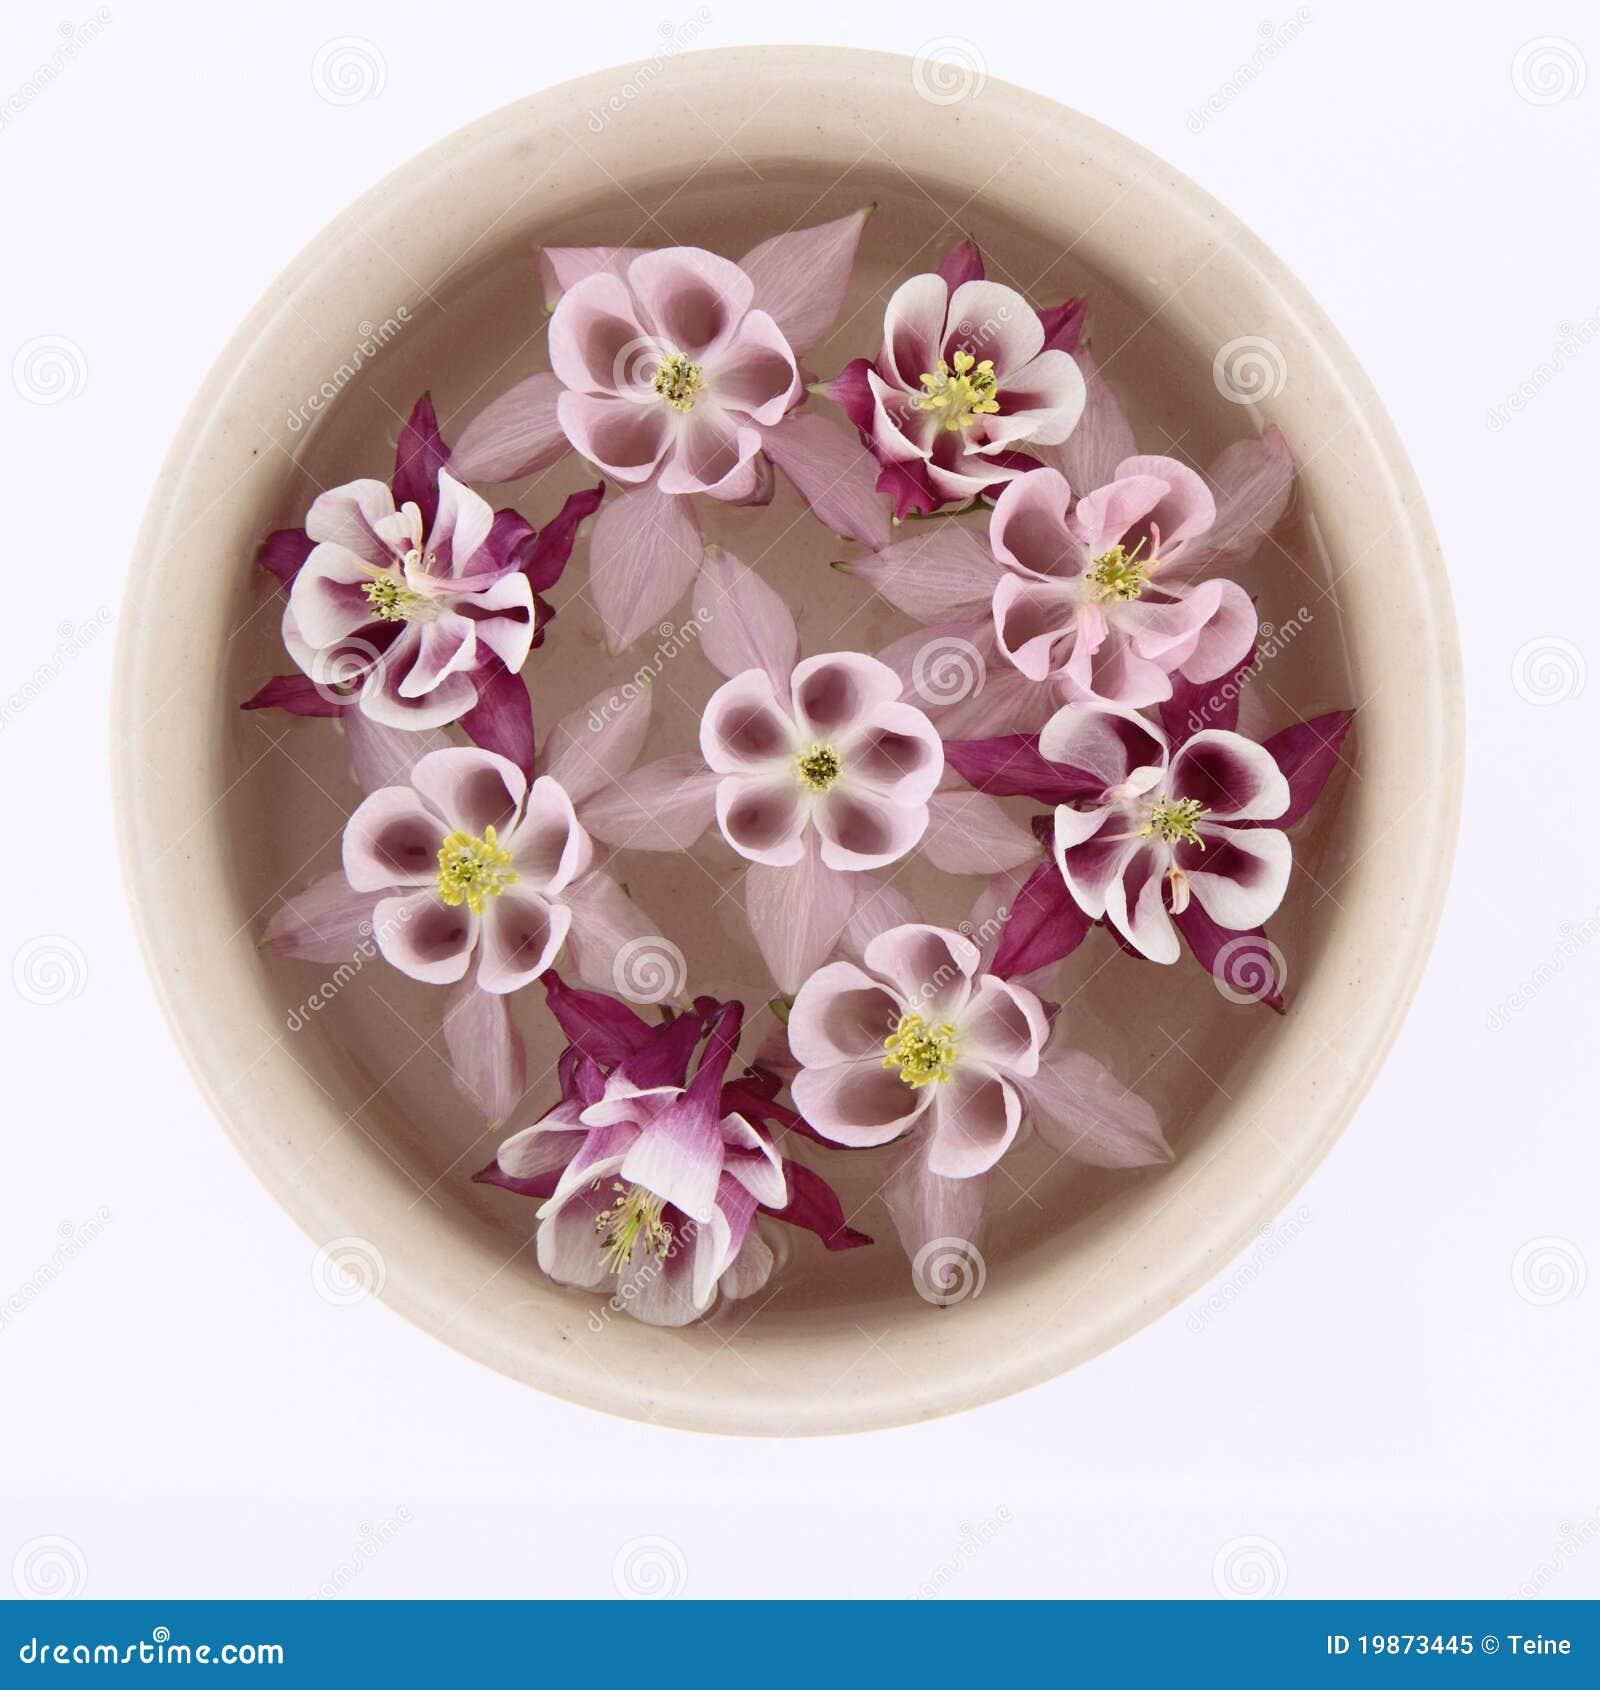 Columbine flowers floating